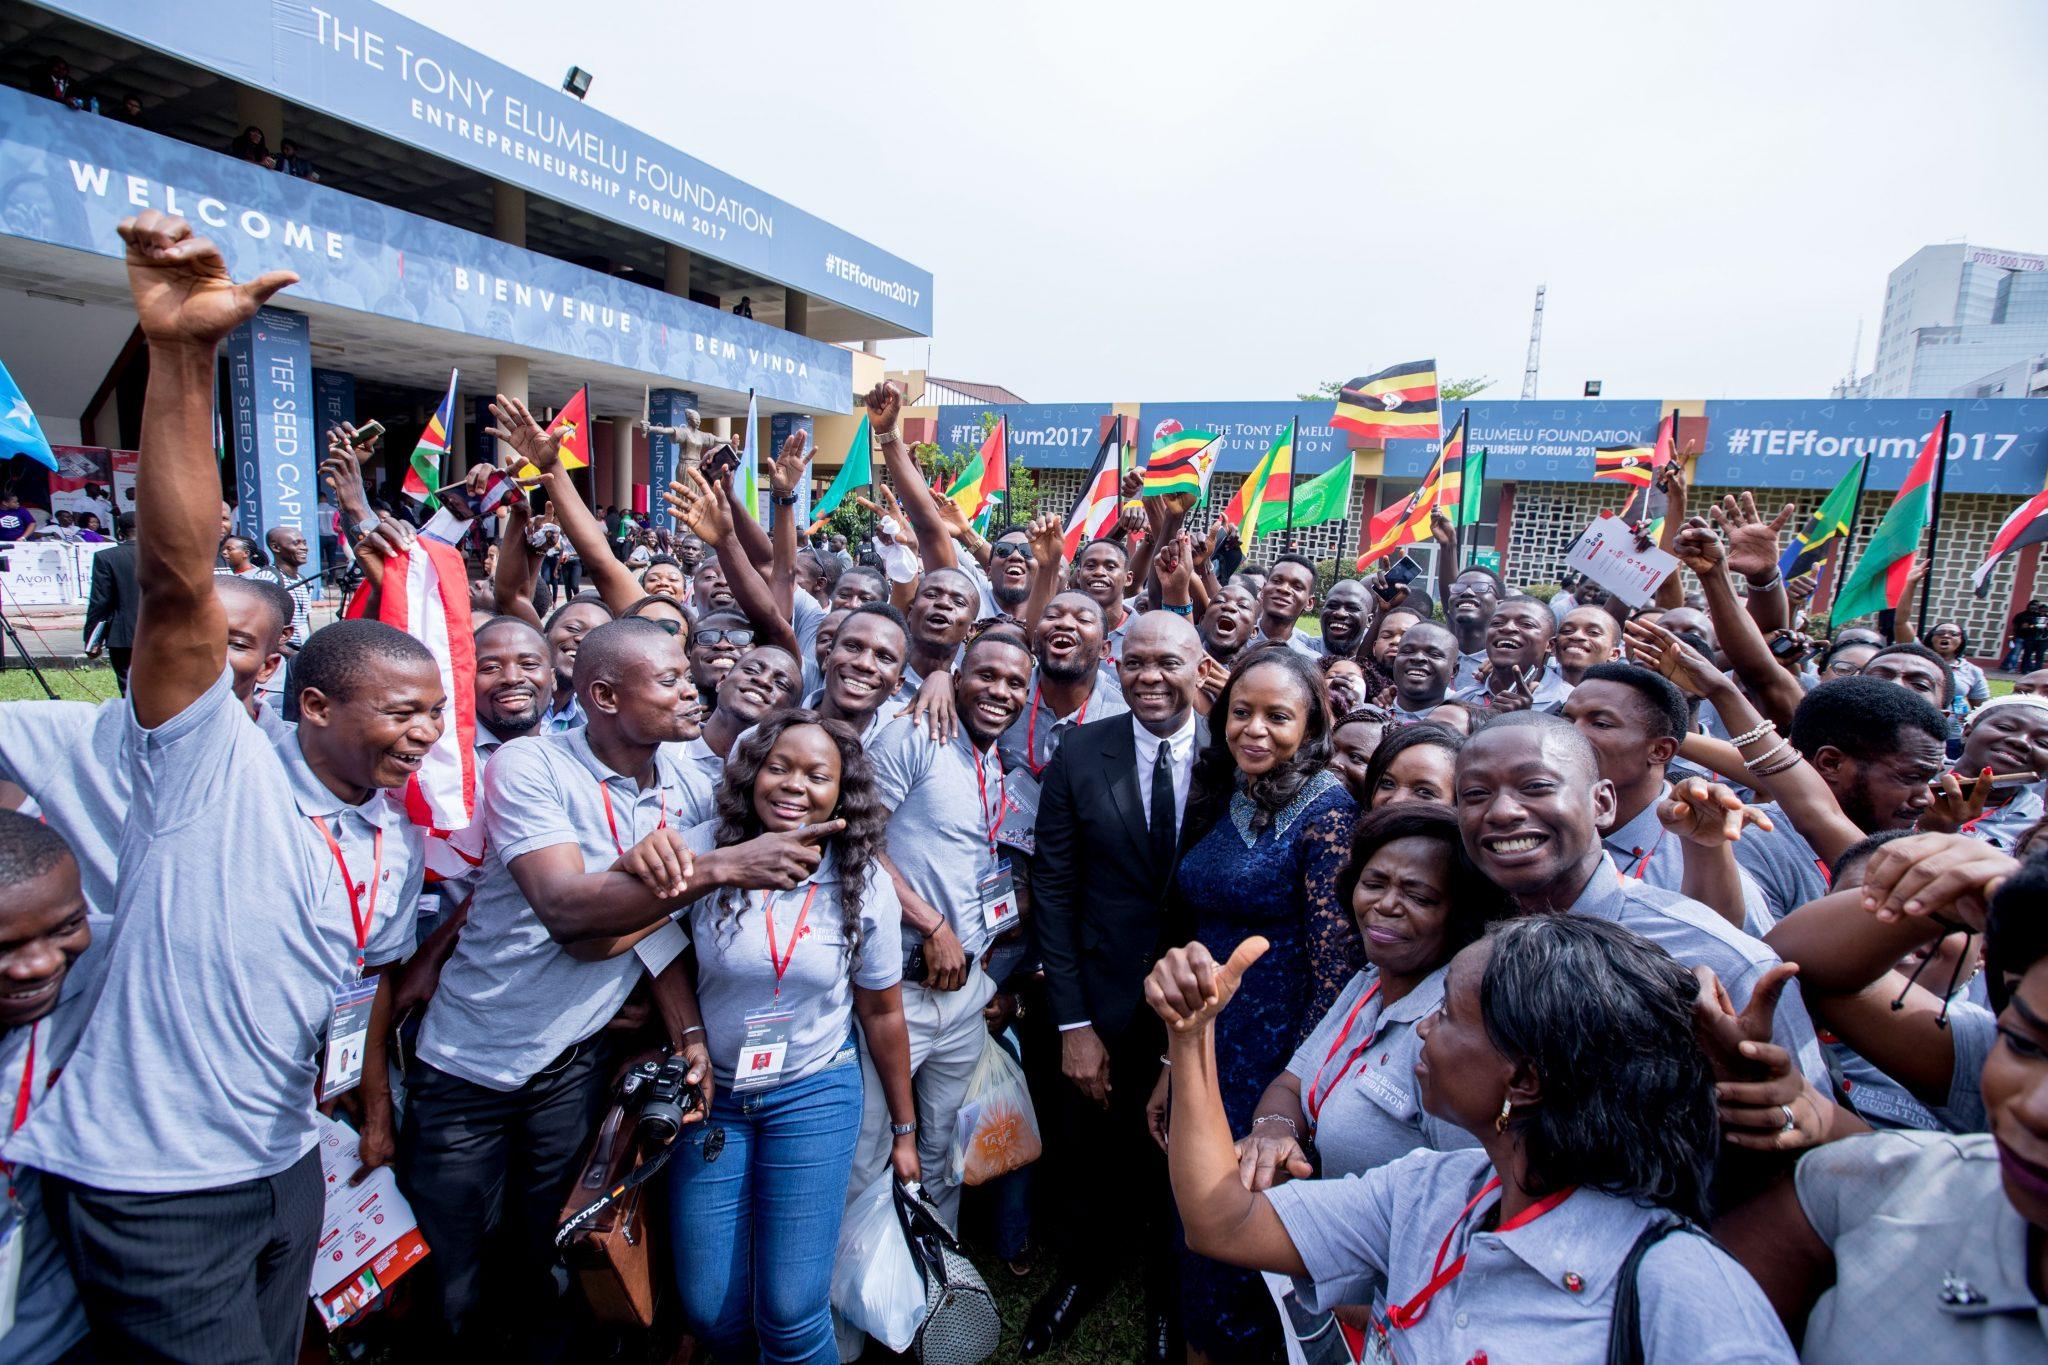 Tony Elumelu Foundation opens entry for TEF entrepreneurship programme